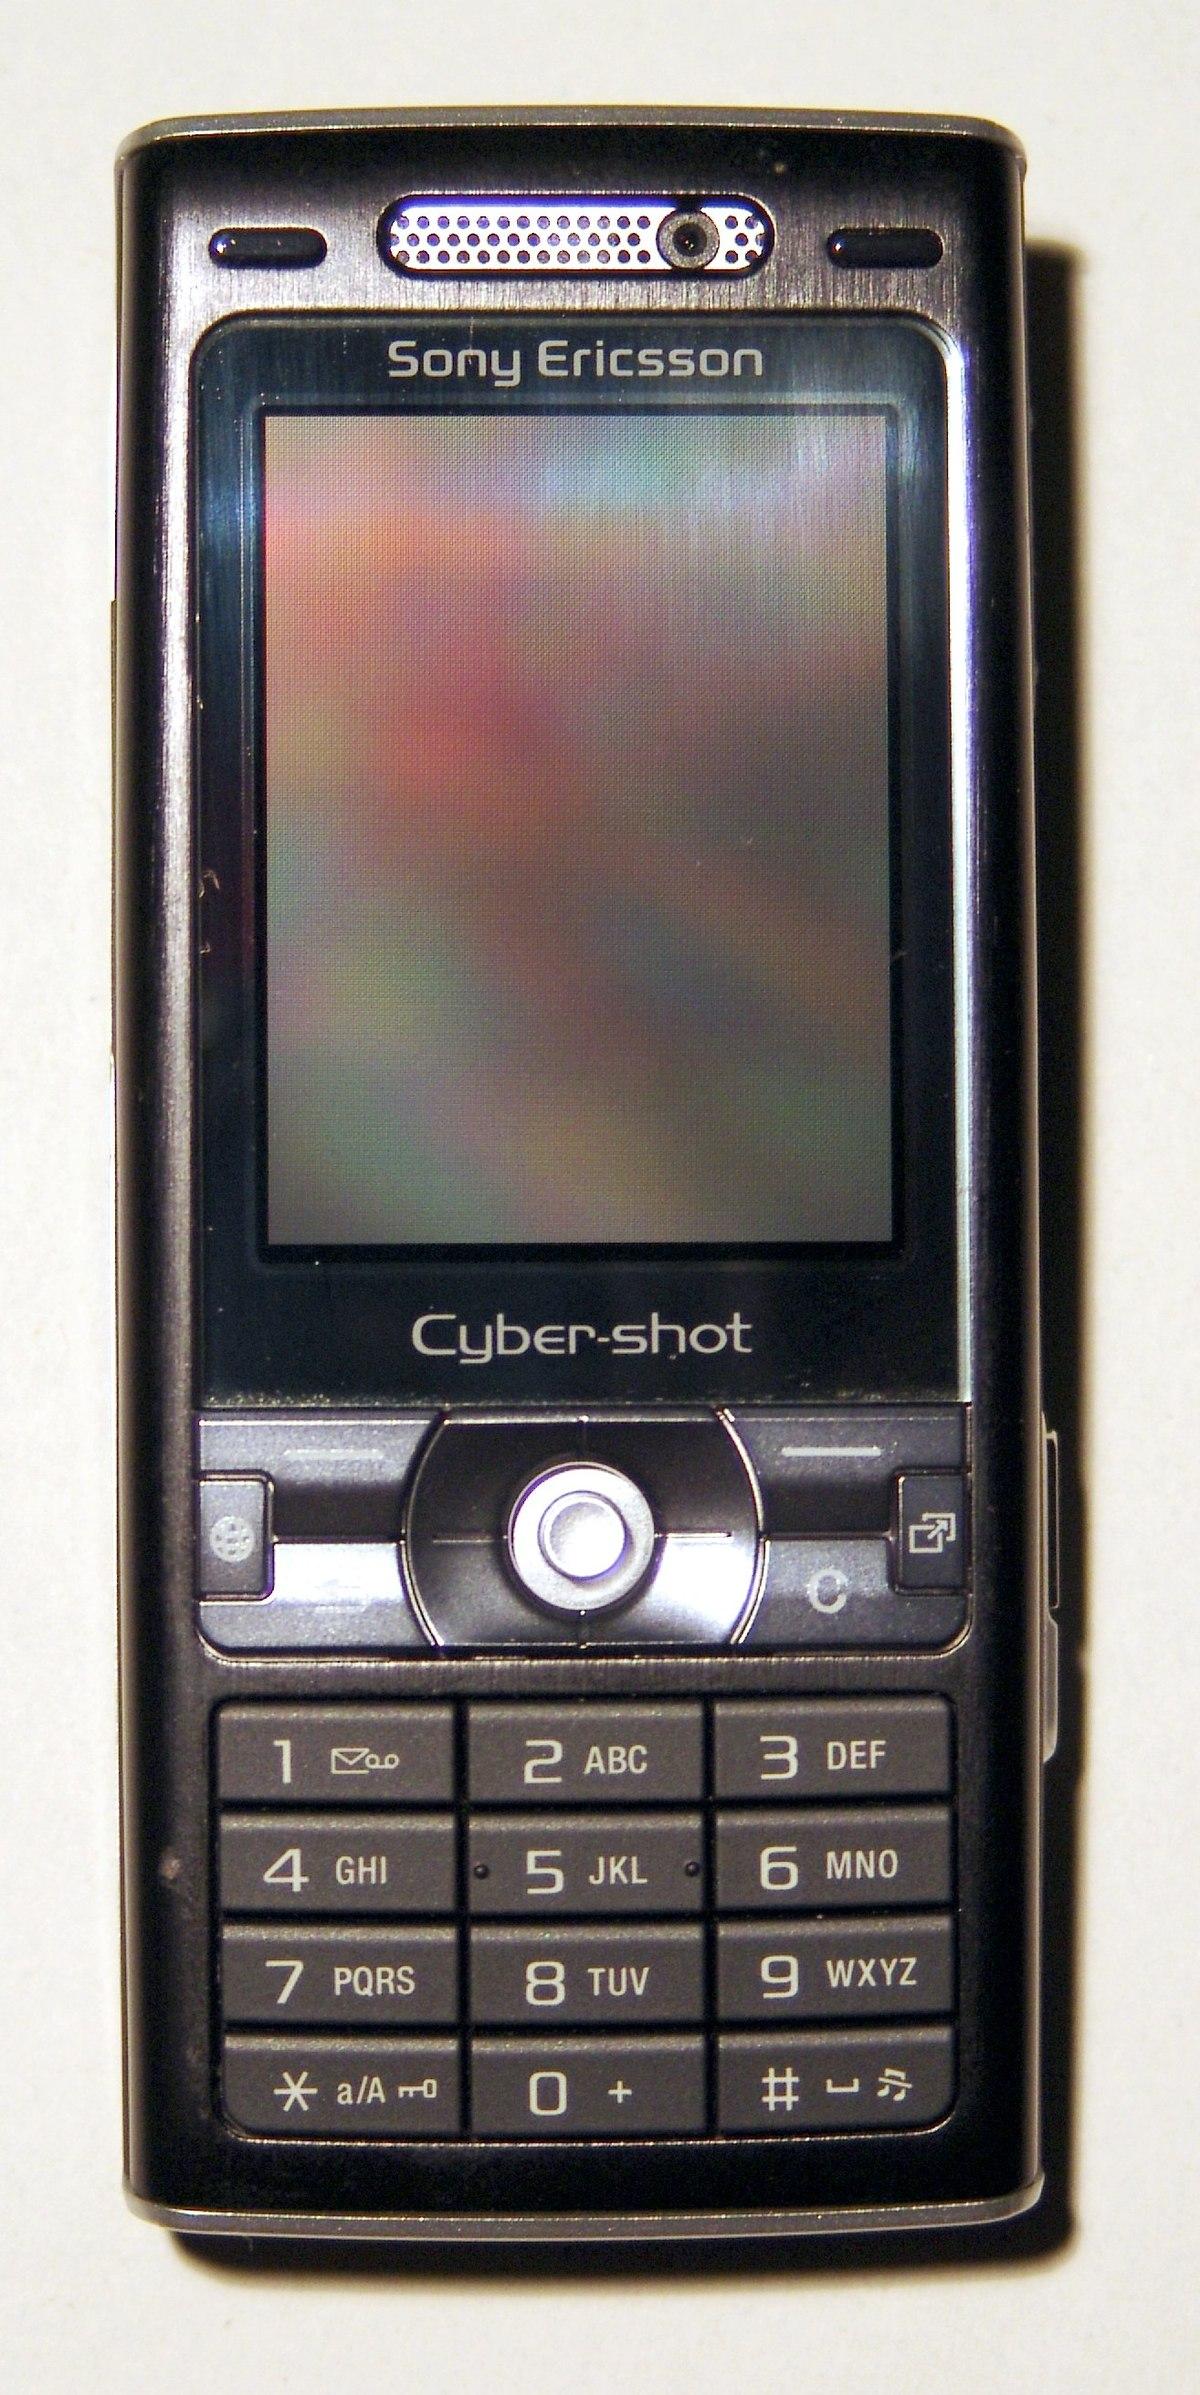 Sony Ericsson K800  Wikipedia